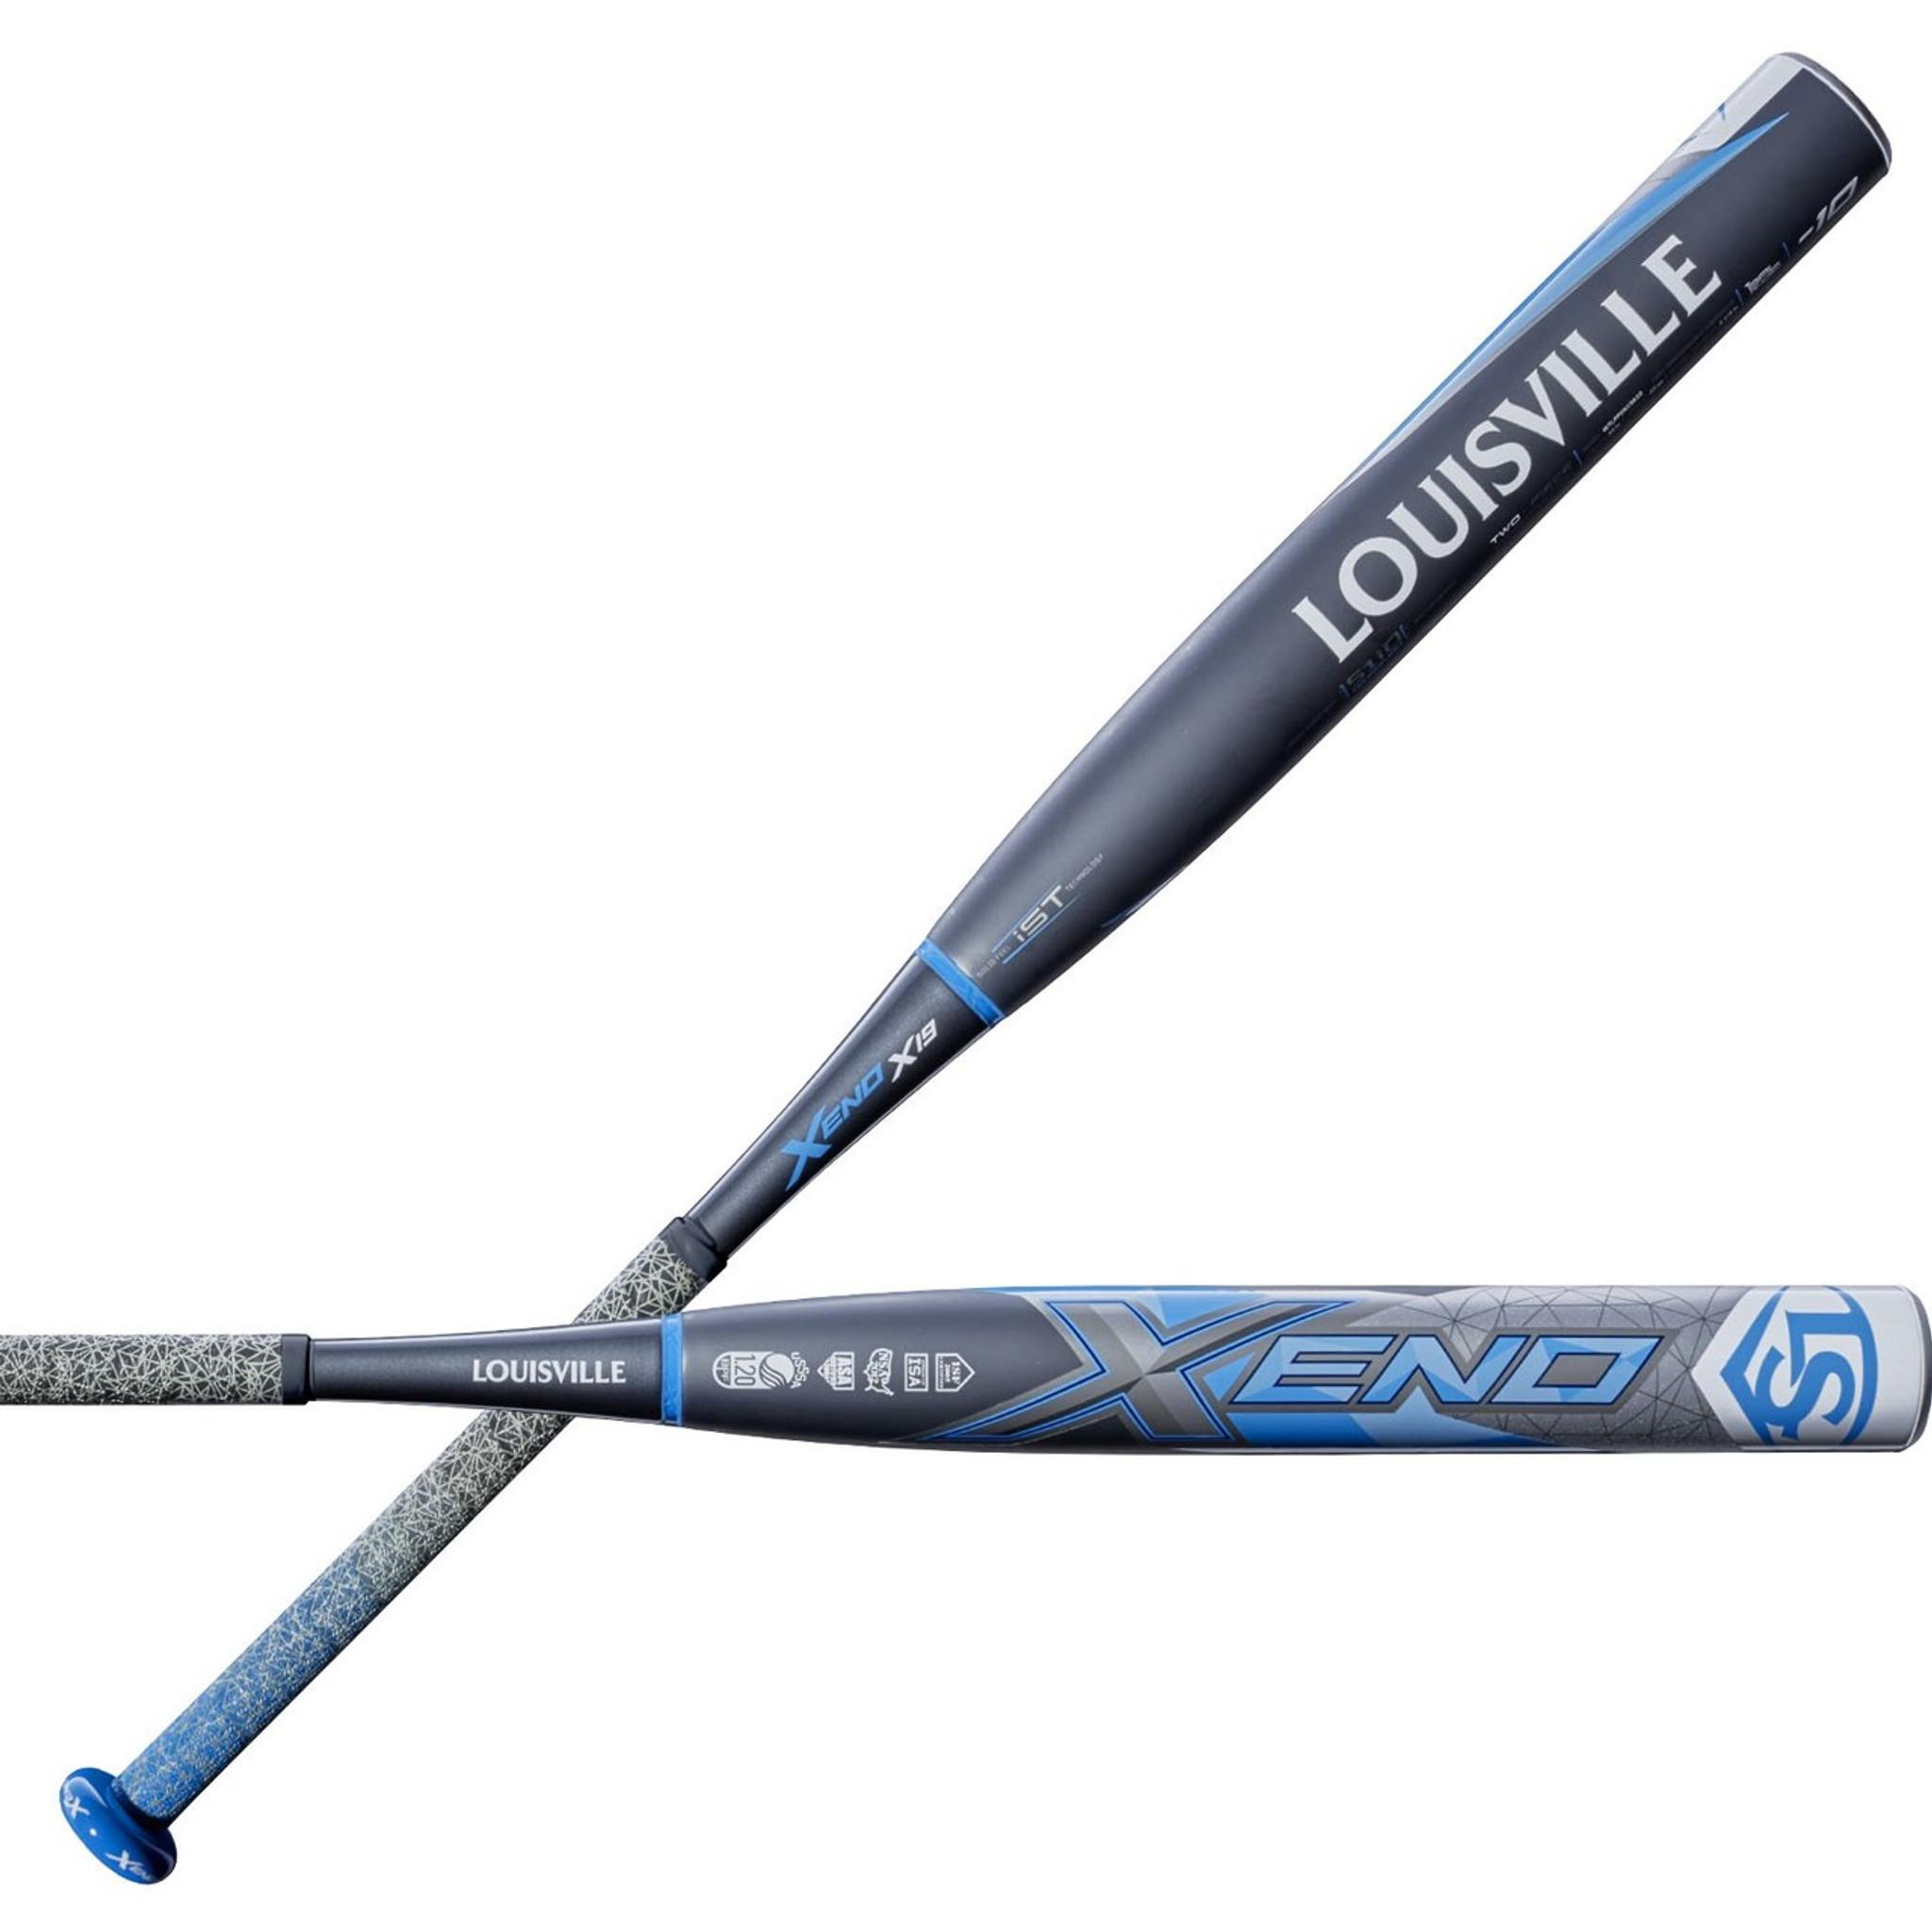 2019 Louisville Slugger Xeno -11 Fastpitch Softball Bat WTLFPXN19A11